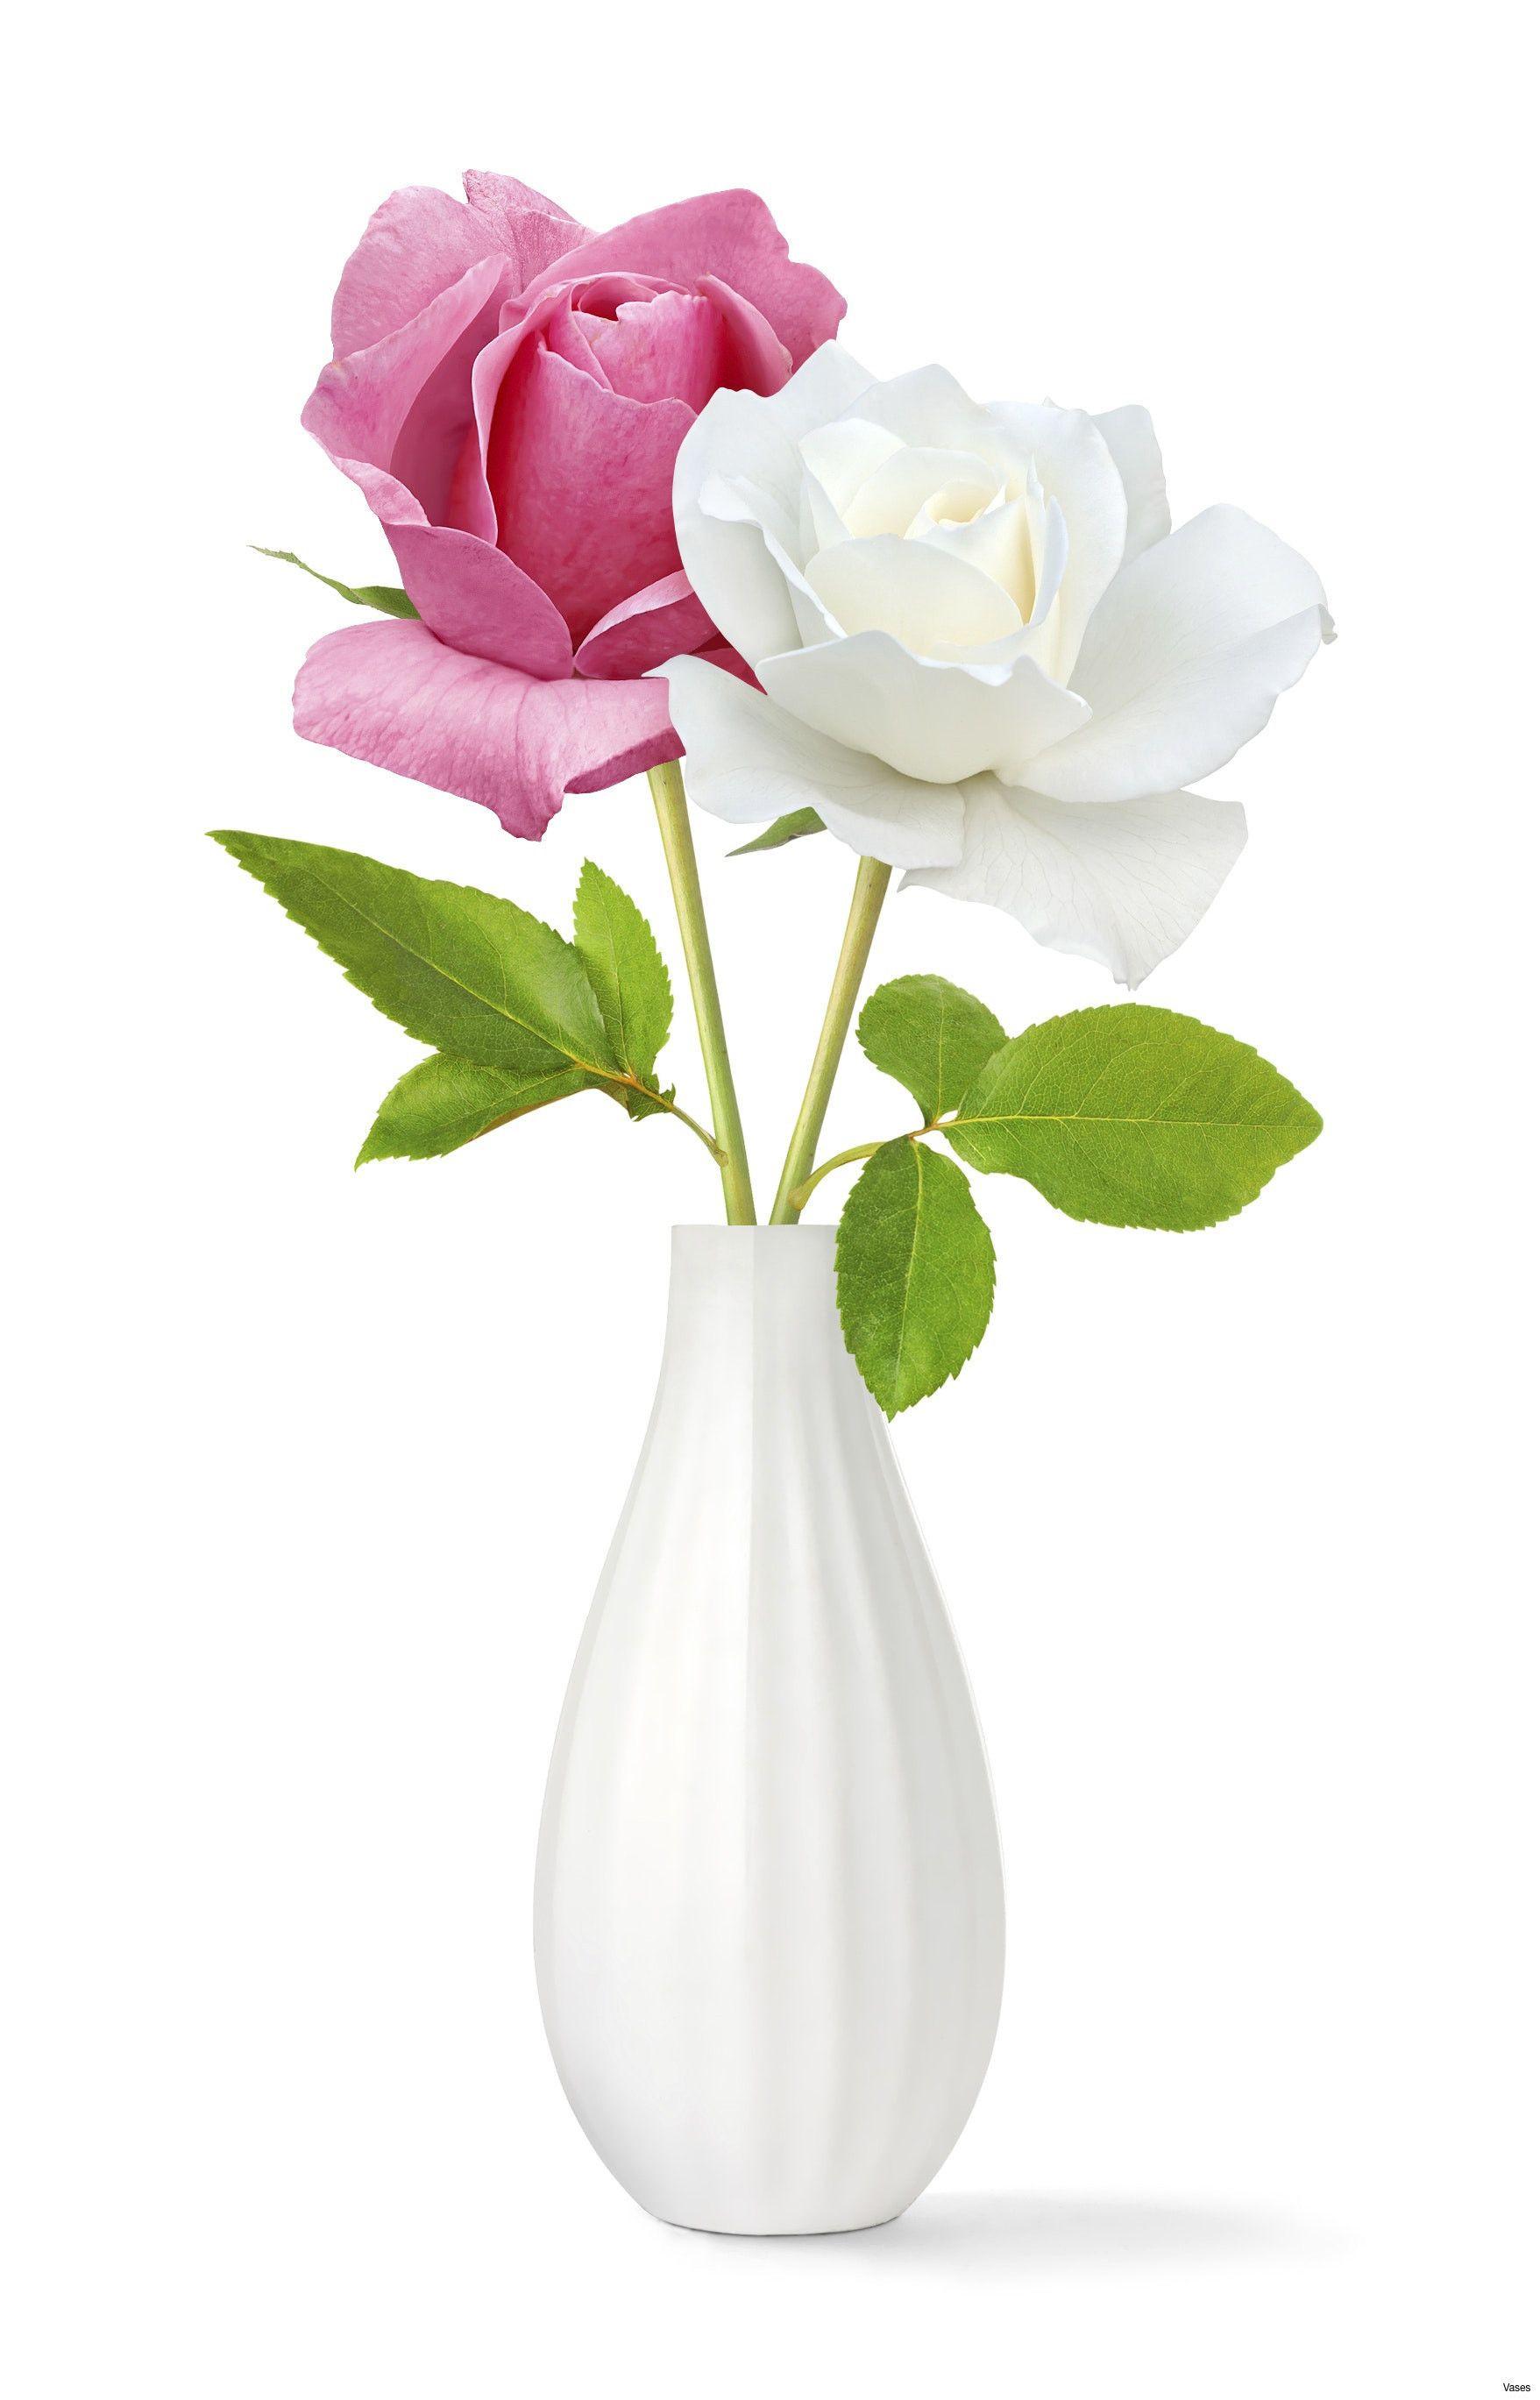 contemporary white vase of light pink vase elegant roses red in a vase singleh vases rose within light pink vase elegant roses red in a vase singleh vases rose single i 0d scheme